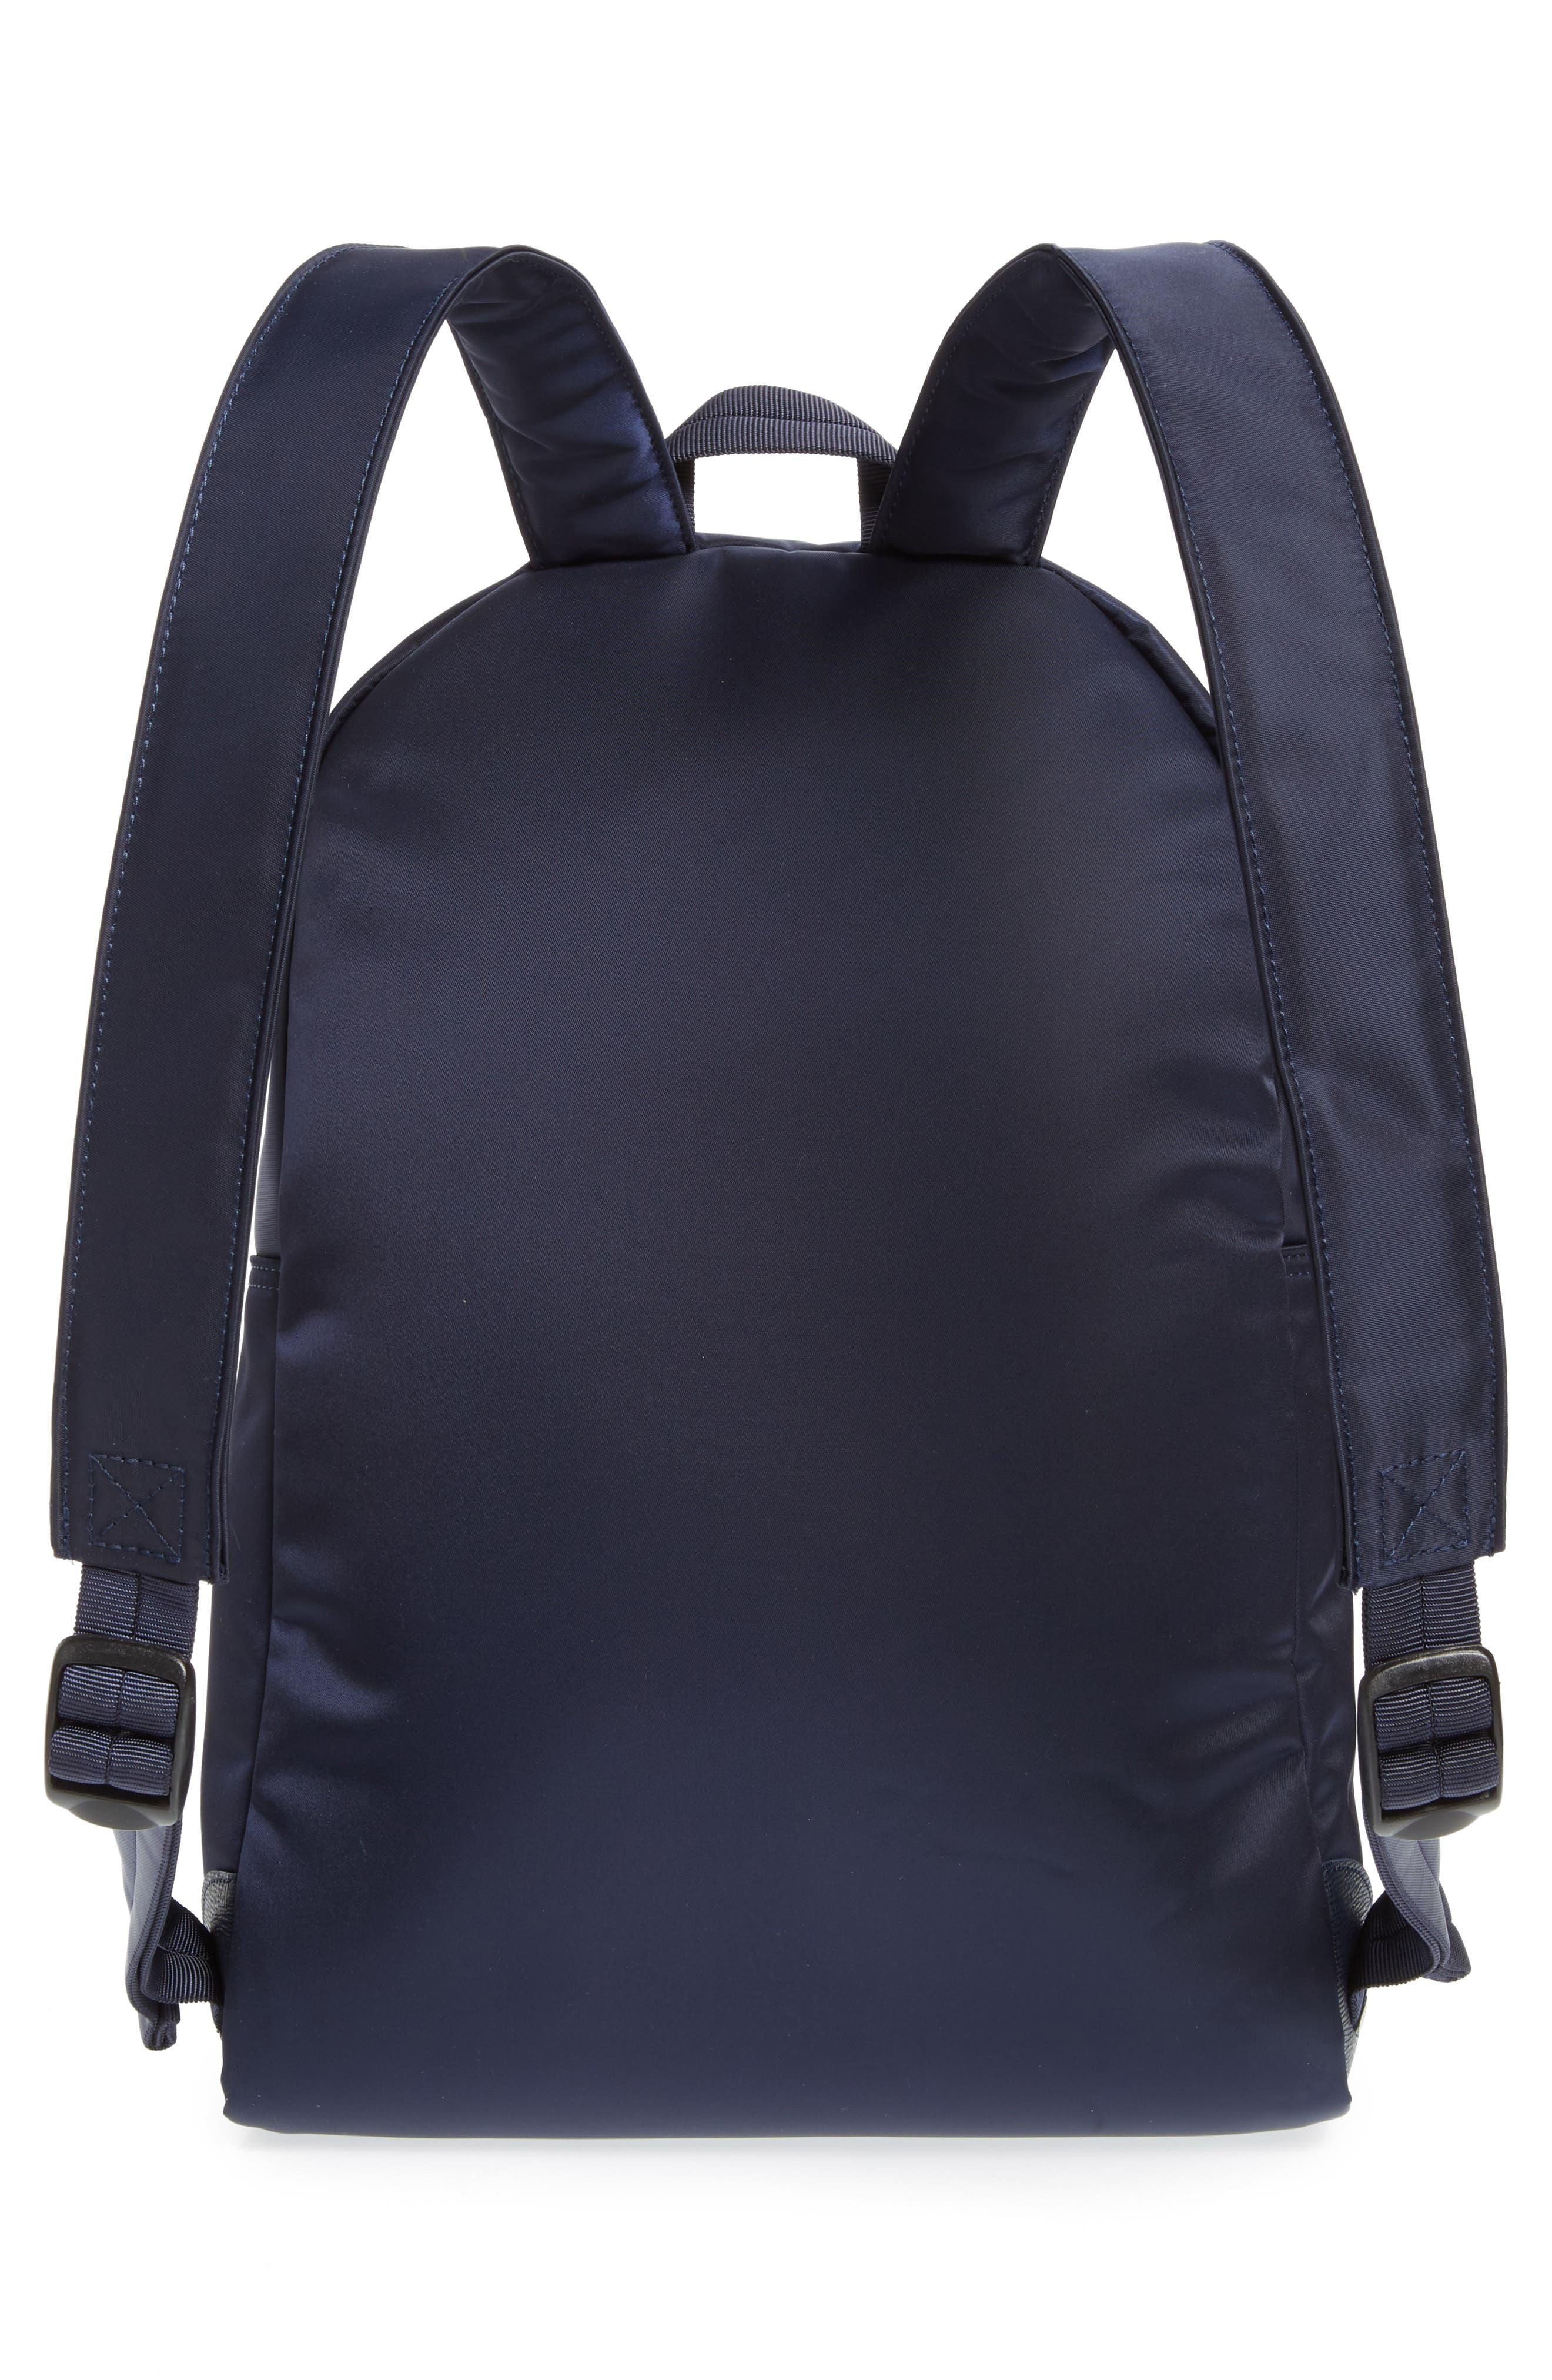 LONGCHAMP, 'Le Pliage Neo' Nylon Backpack, Alternate thumbnail 4, color, NAVY BLUE